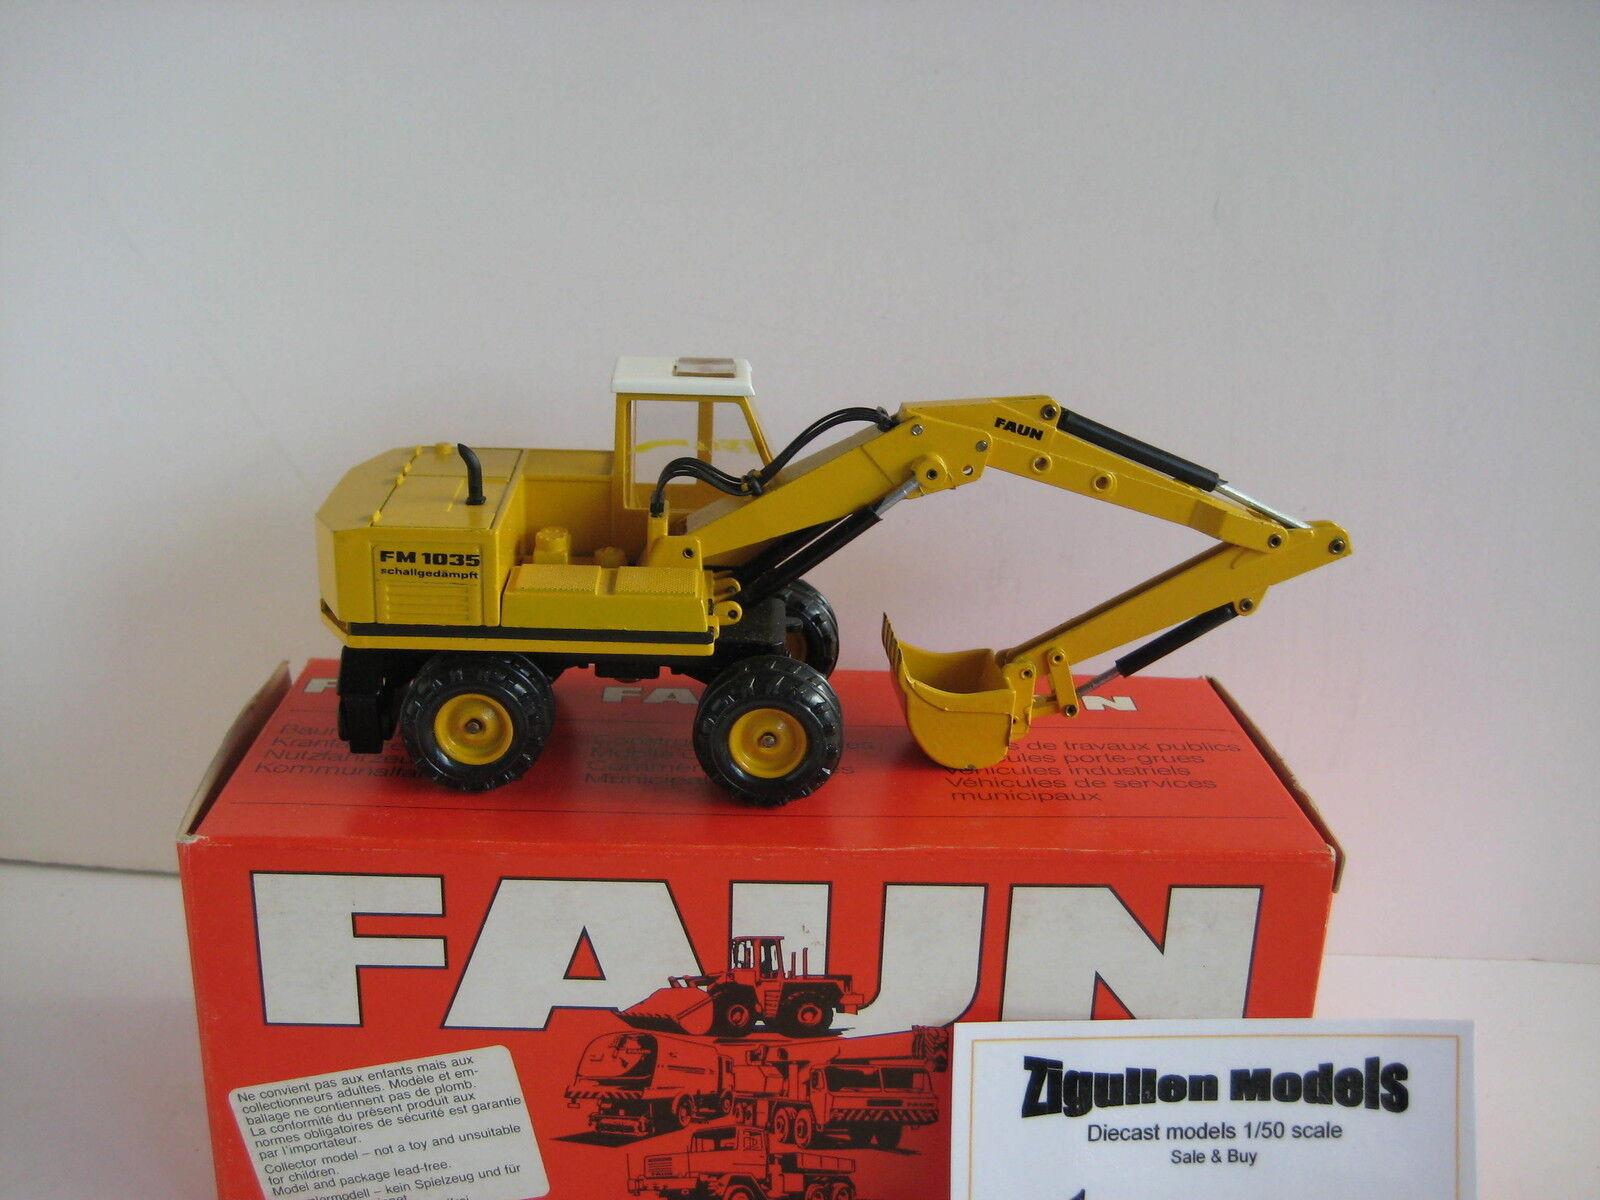 Faune FM 1035 Excavateurs tieflöffel mobile #174.4 NZG 1:50 neuf neuf neuf dans sa boîte   Authentique  eb8e1b